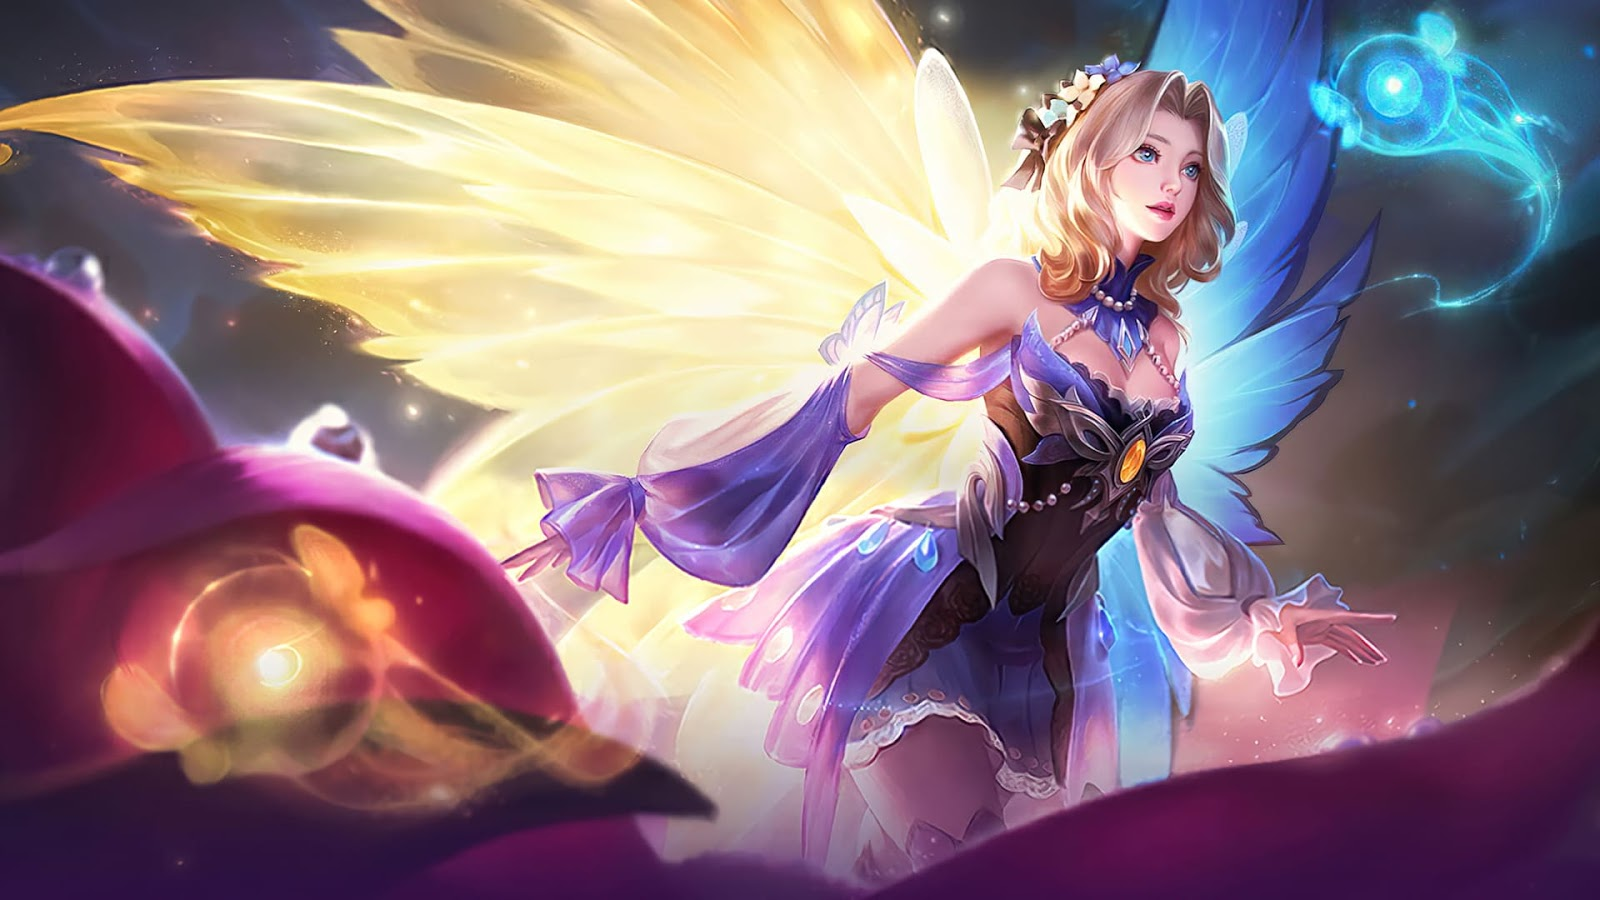 Wallpaper Lunox Butterfly Seraphim Skin Mobile Legends Full HD for PC